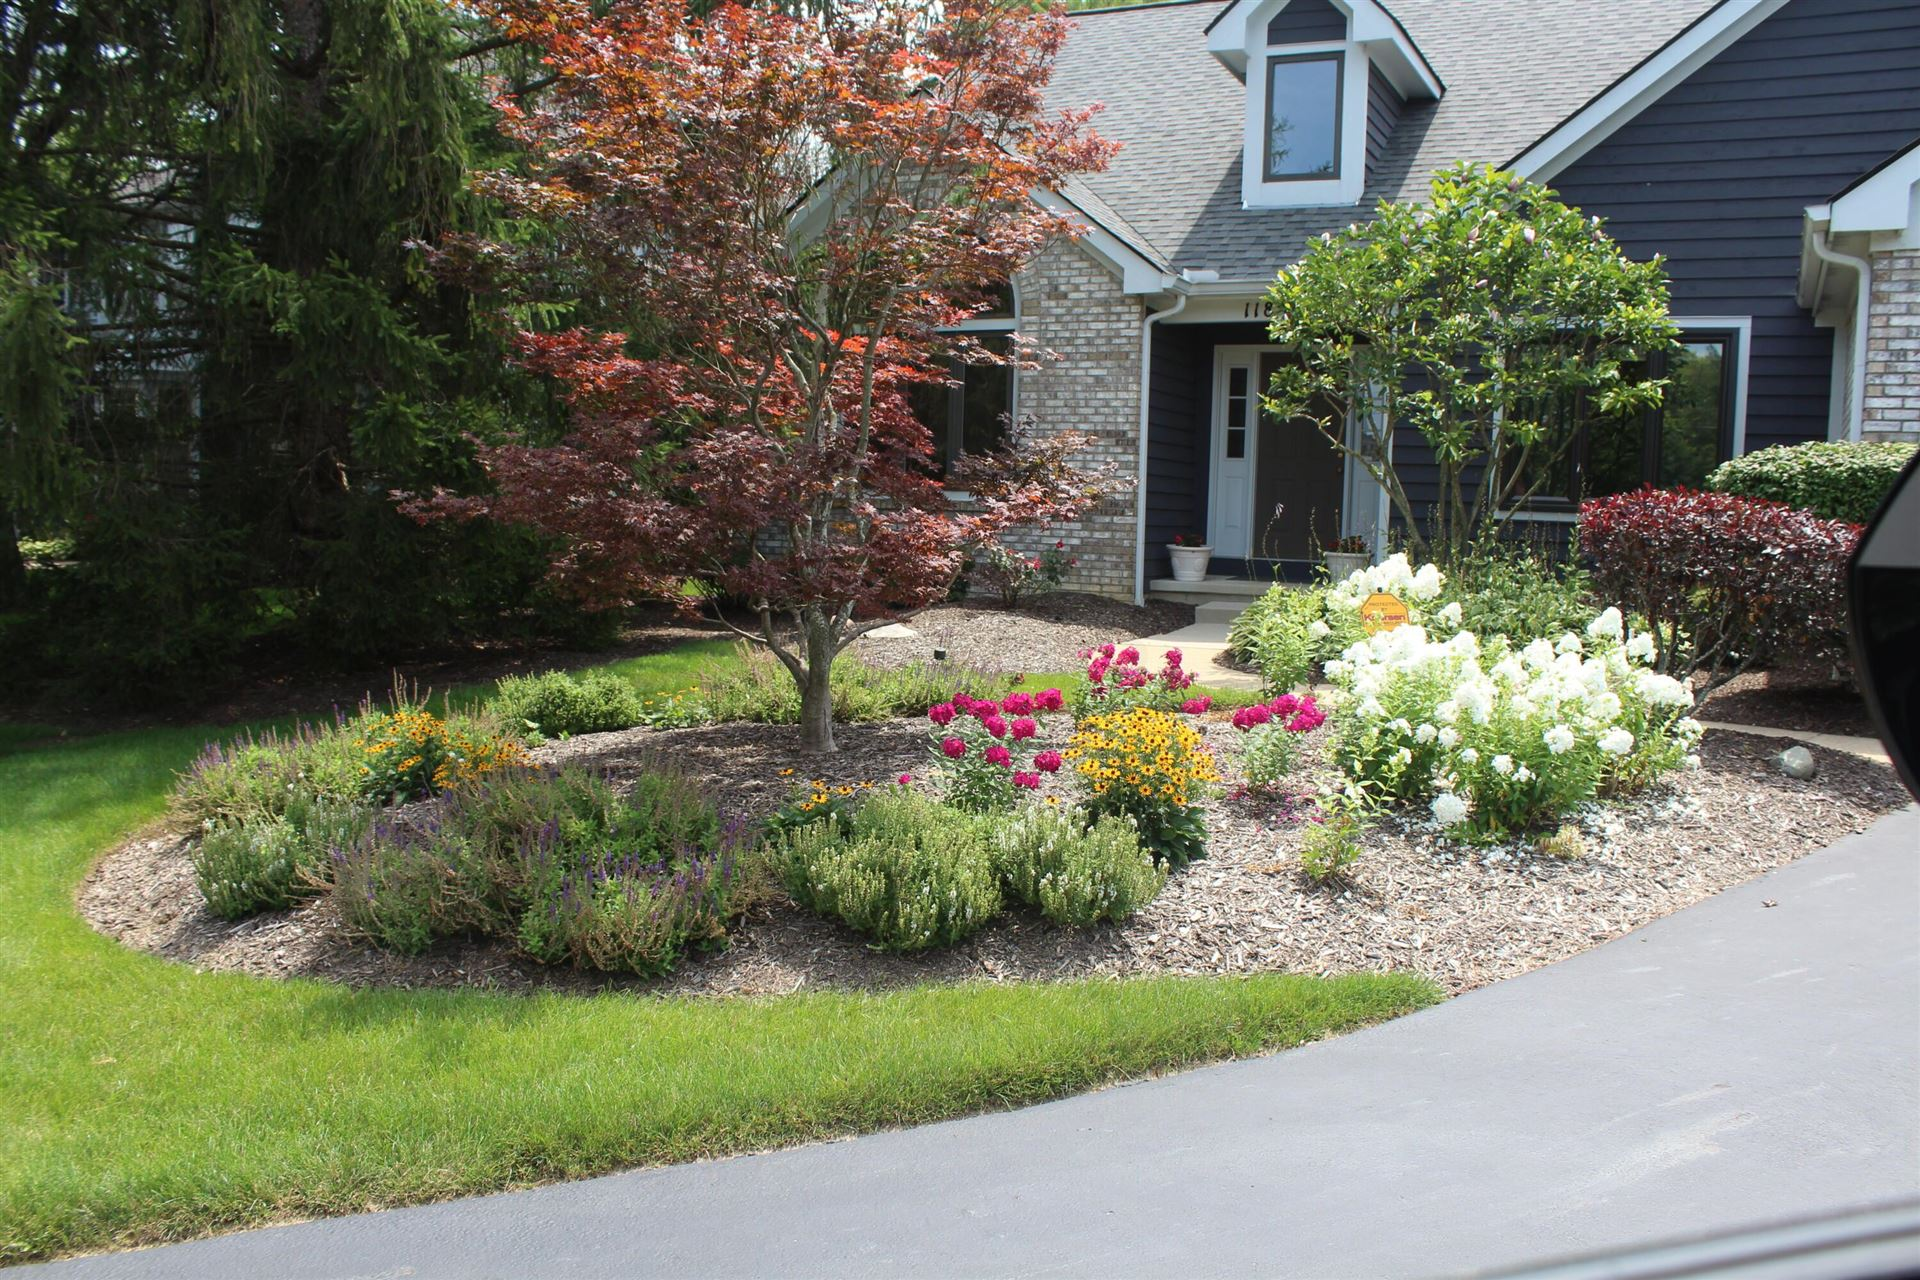 Photo of 1189 Hickory Grove Court, Worthington, OH 43085 (MLS # 221028144)